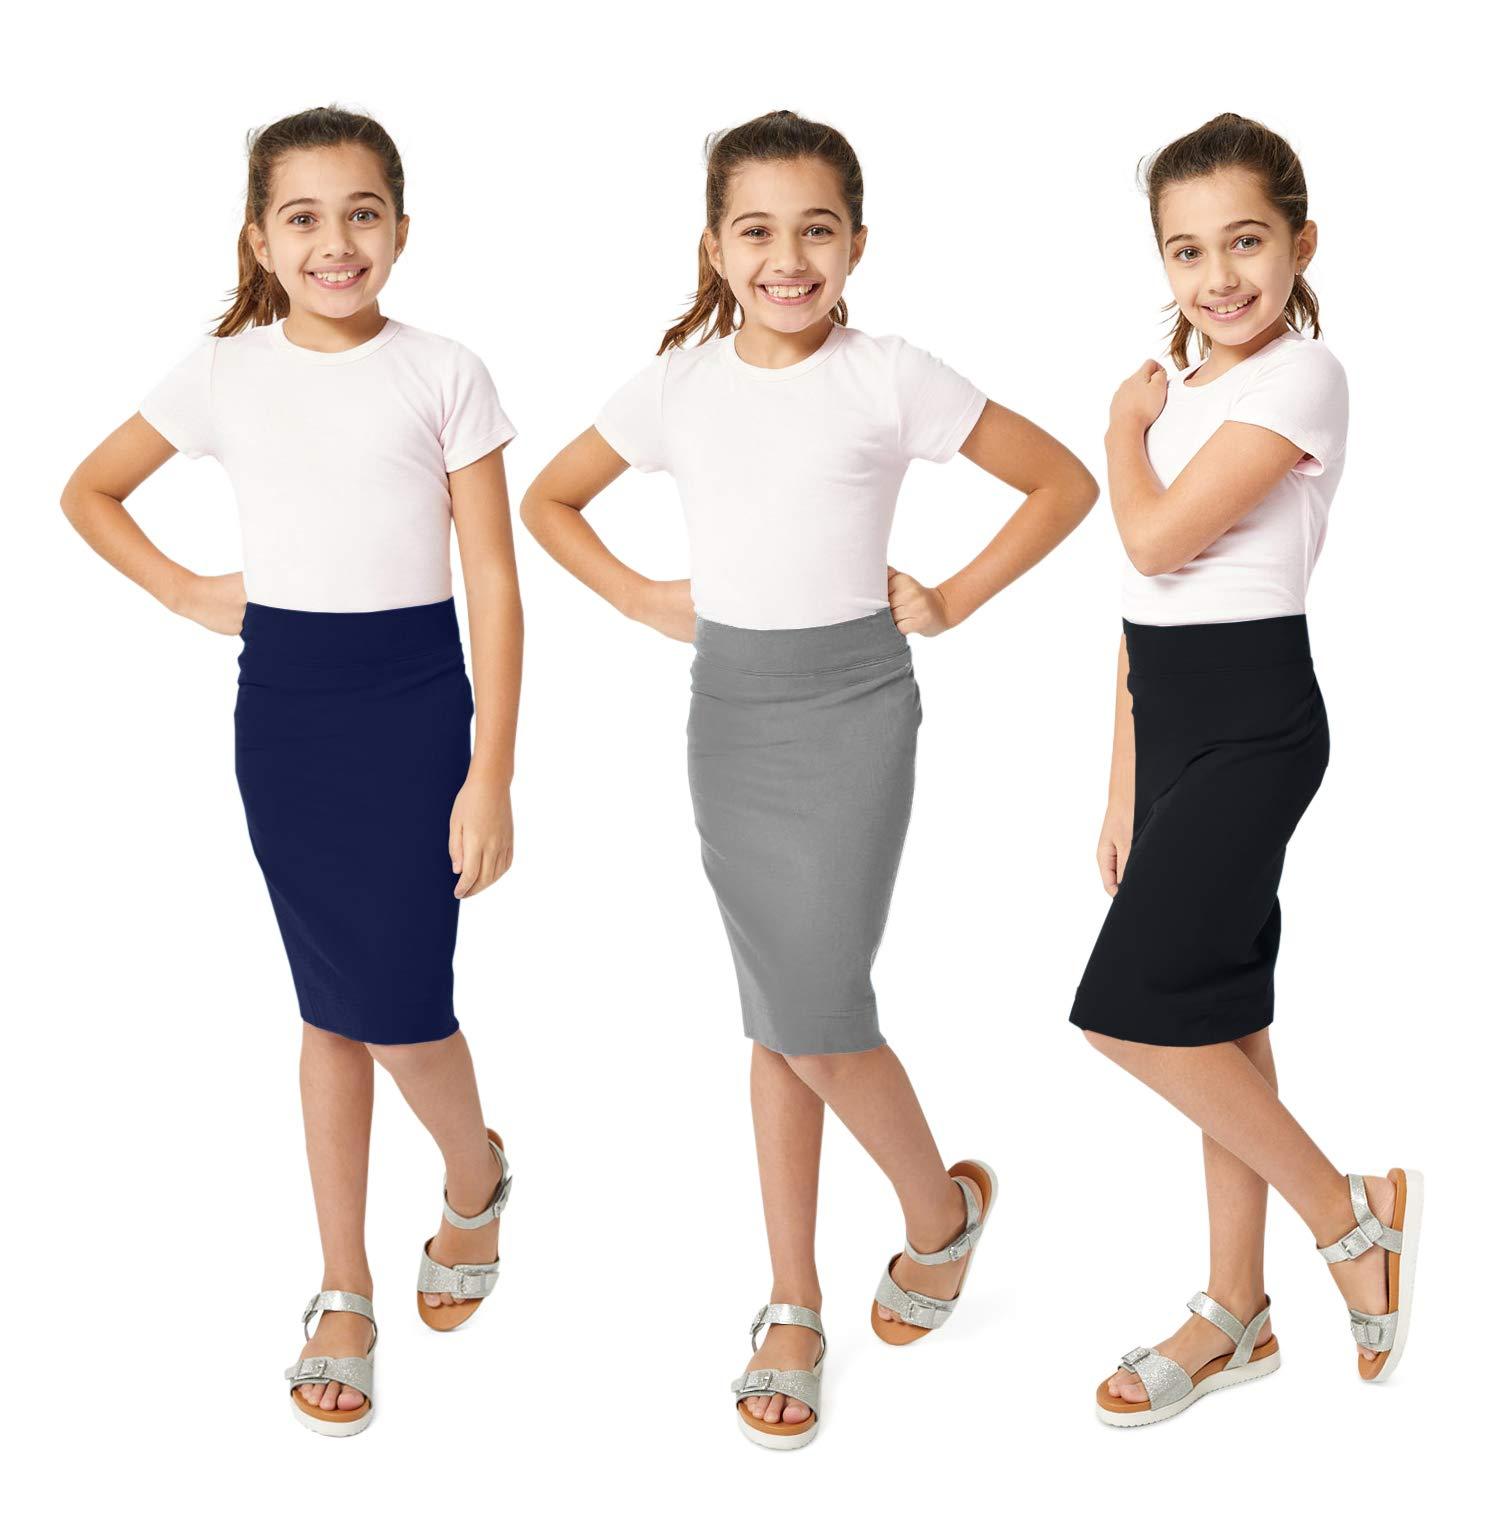 KIDPIK Girls Pencil Skirts (3 Pack) - Multi-Color - (Medium (10), Grey/Navy/Black) by KIDPIK